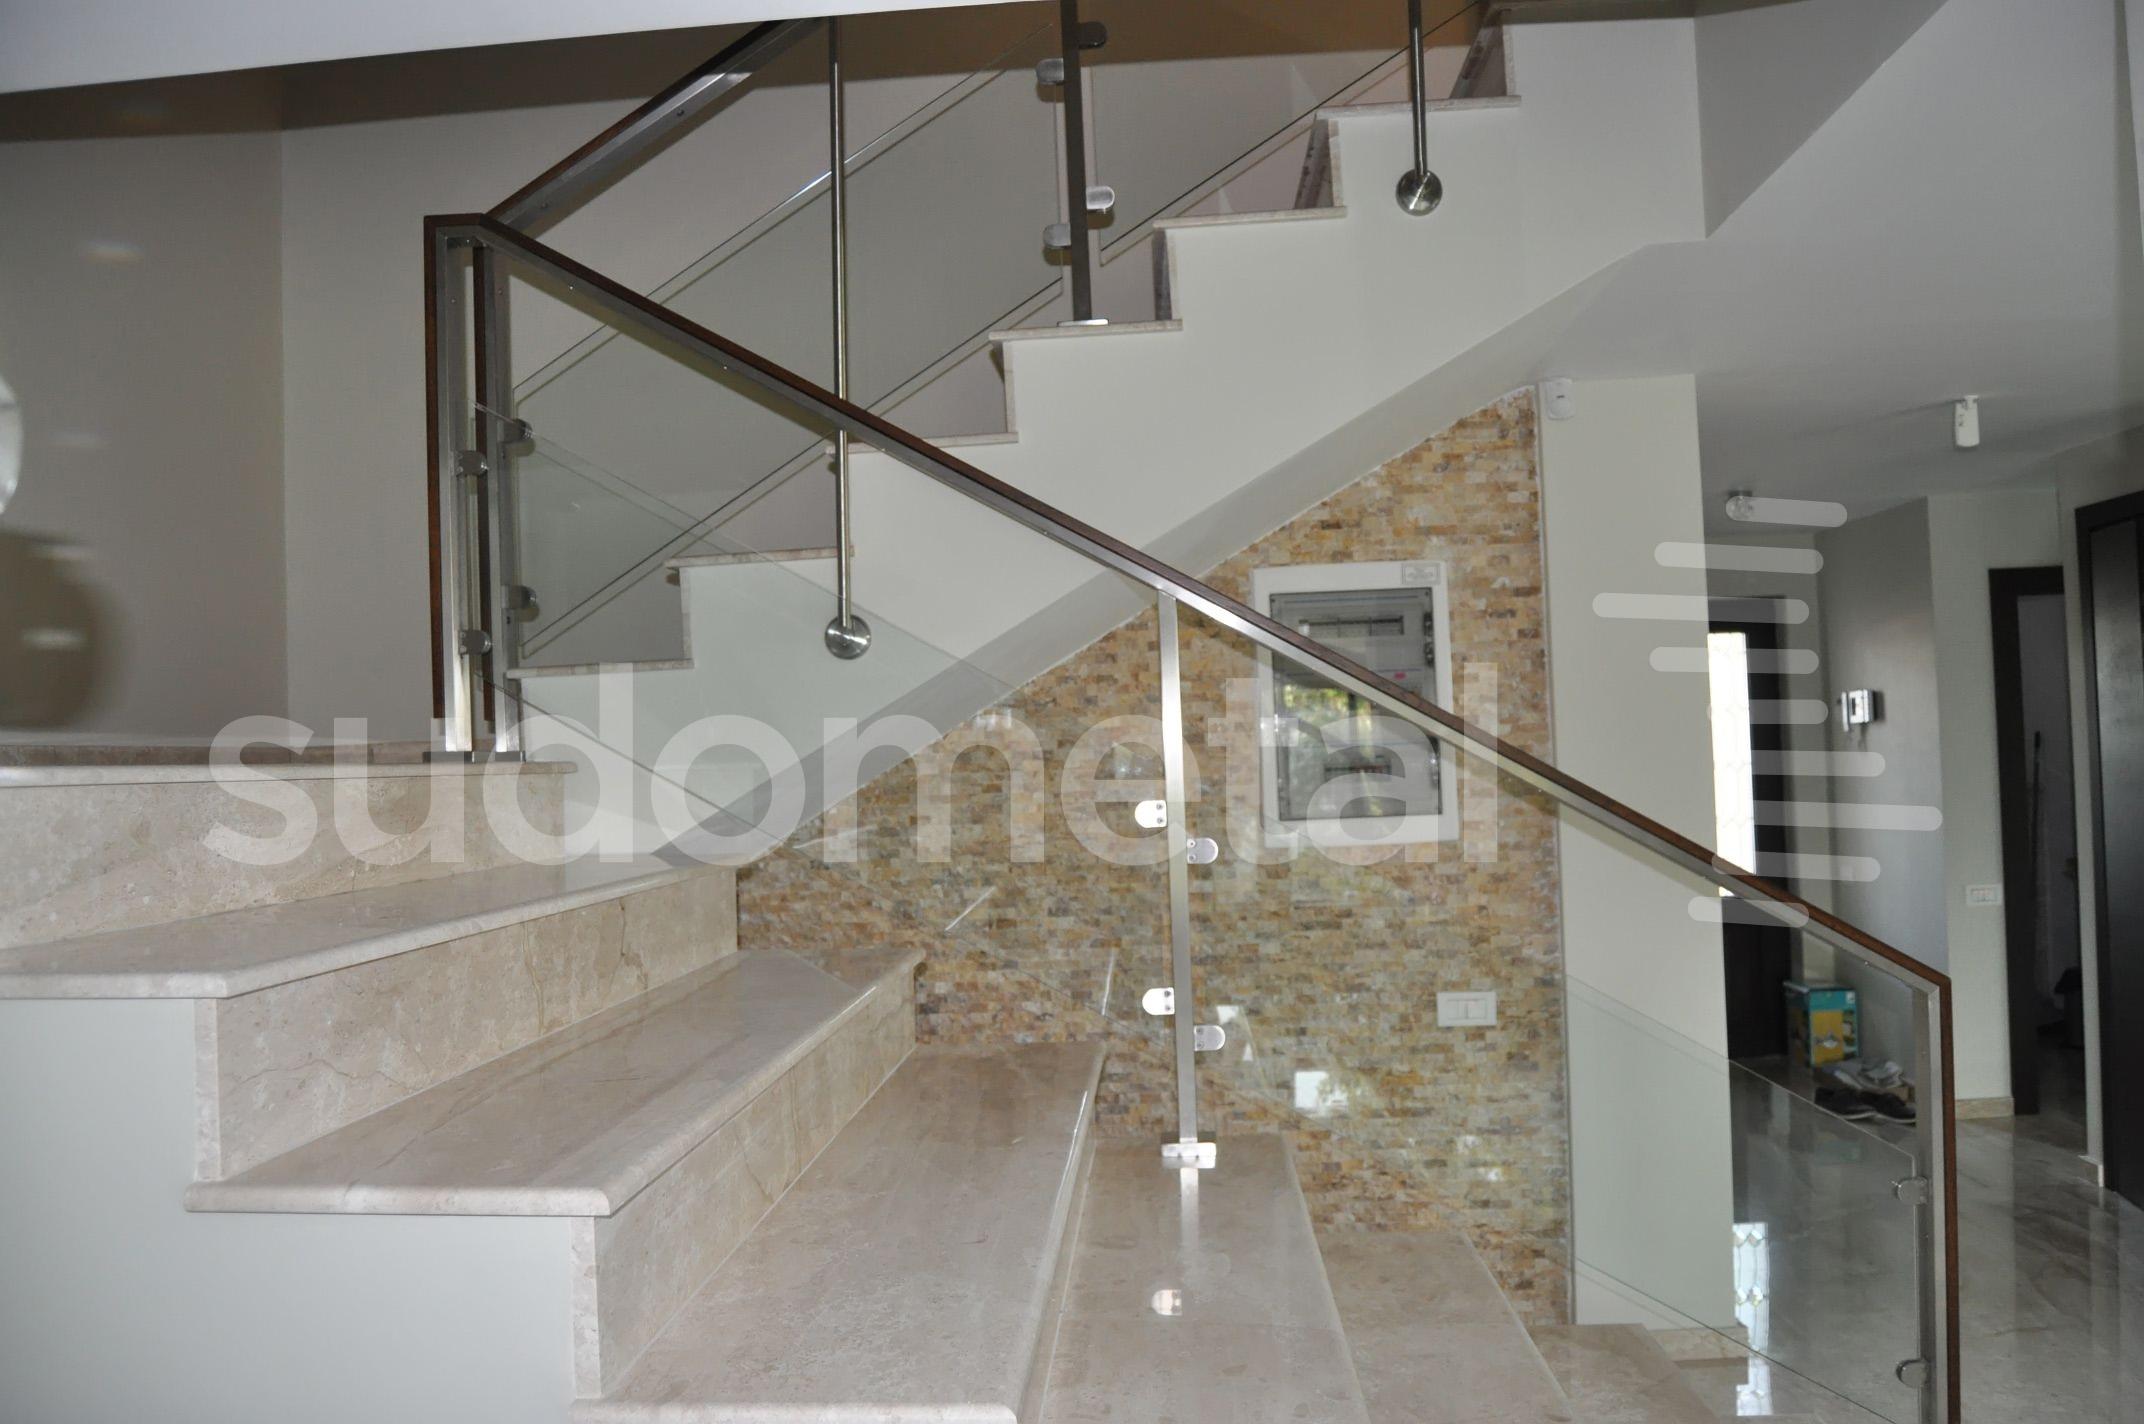 Balustrade din inox-sticla - Balustrada casa particulara llfov SUDOMETAL - Poza 1